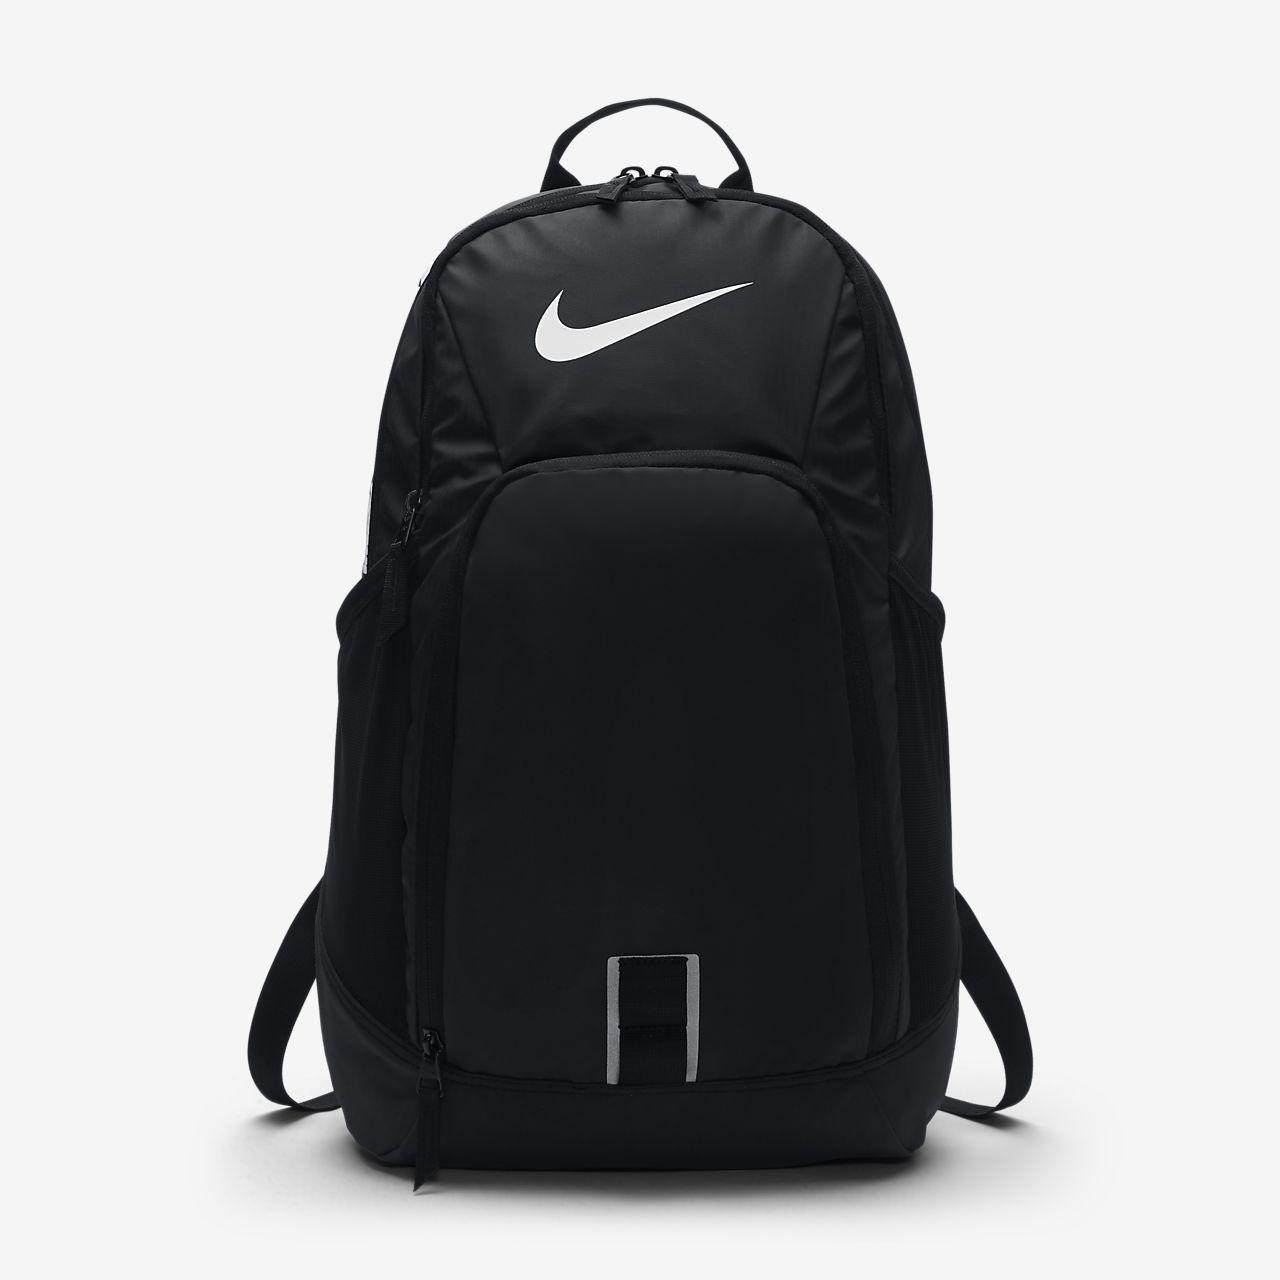 290a09ec827b Nike Alpha Adapt Rev Backpack. Nike.com ID